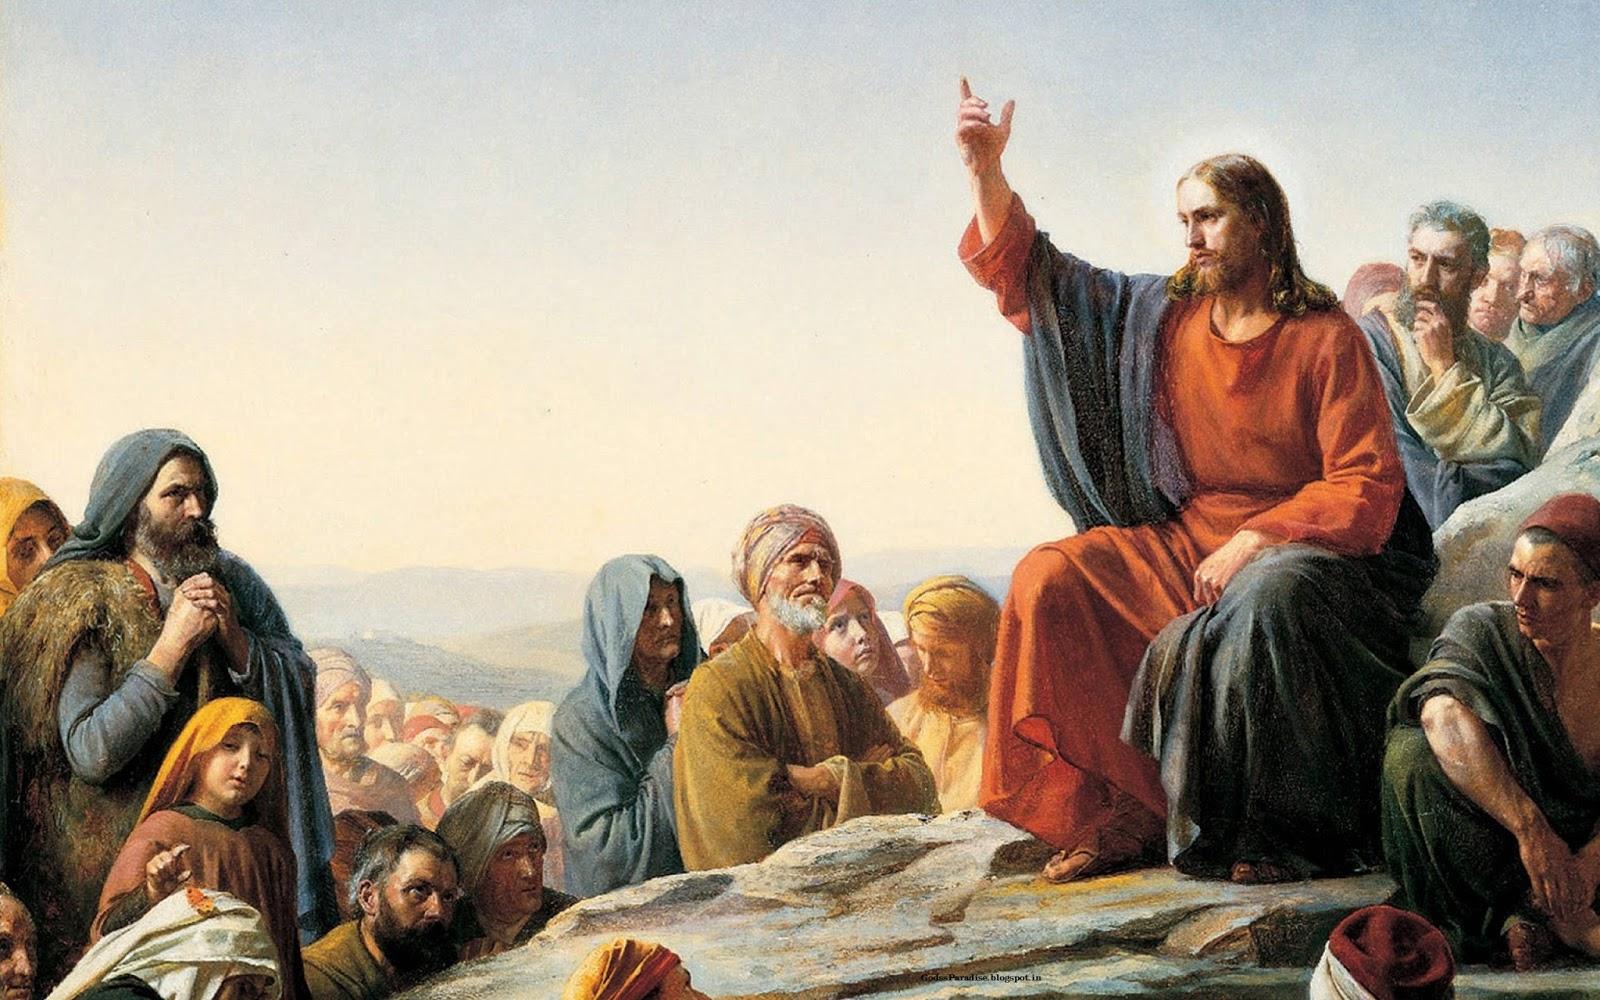 Jesus Hd Wallpapers 2017 Gods Paradise